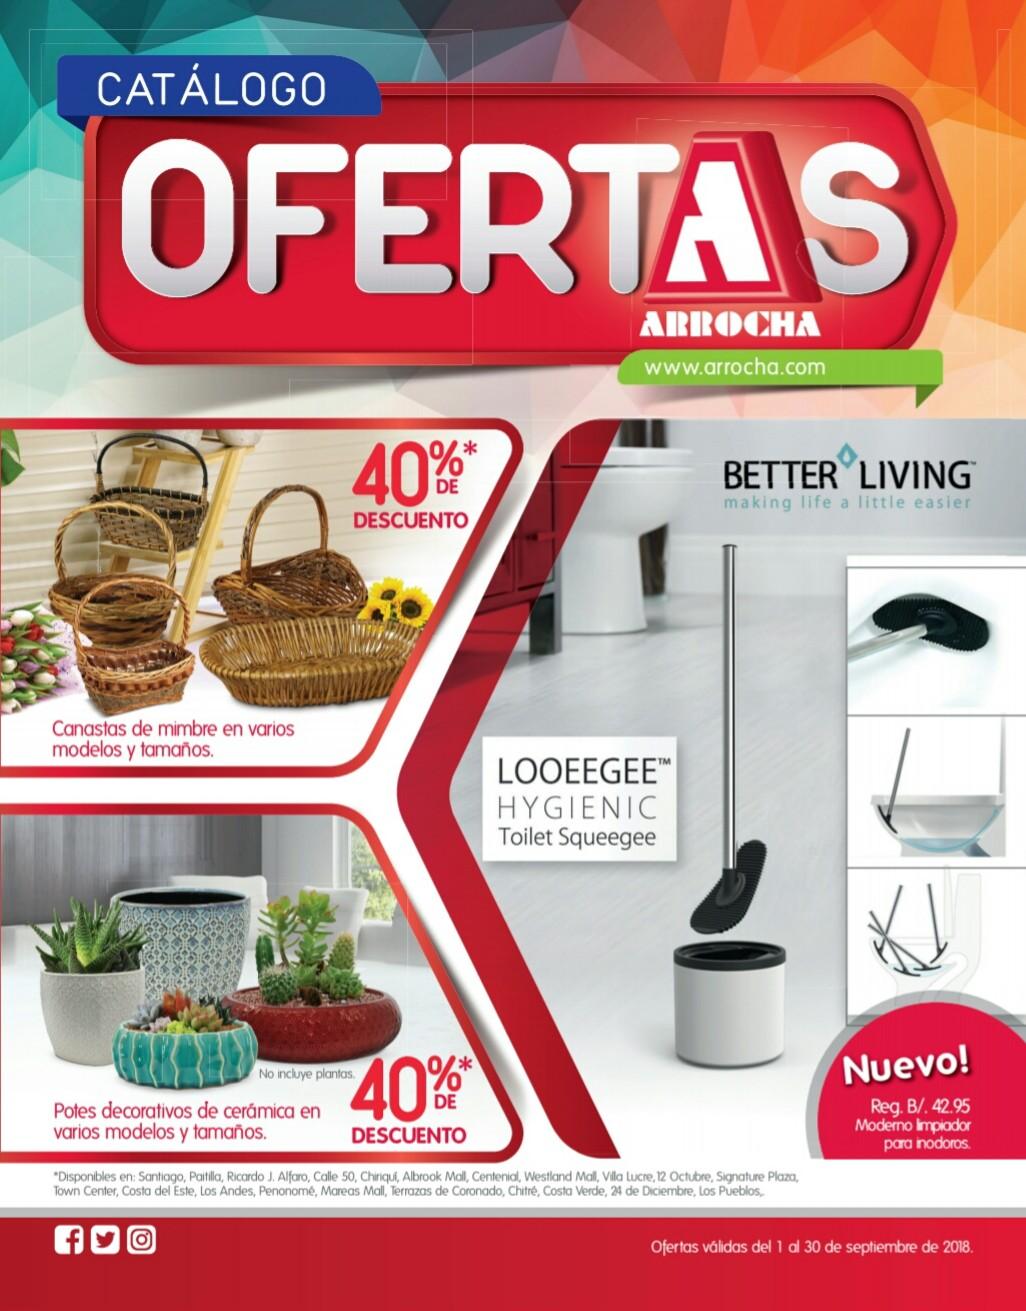 Catalogo de ofertas Arrocha -septiembre 2018 p1